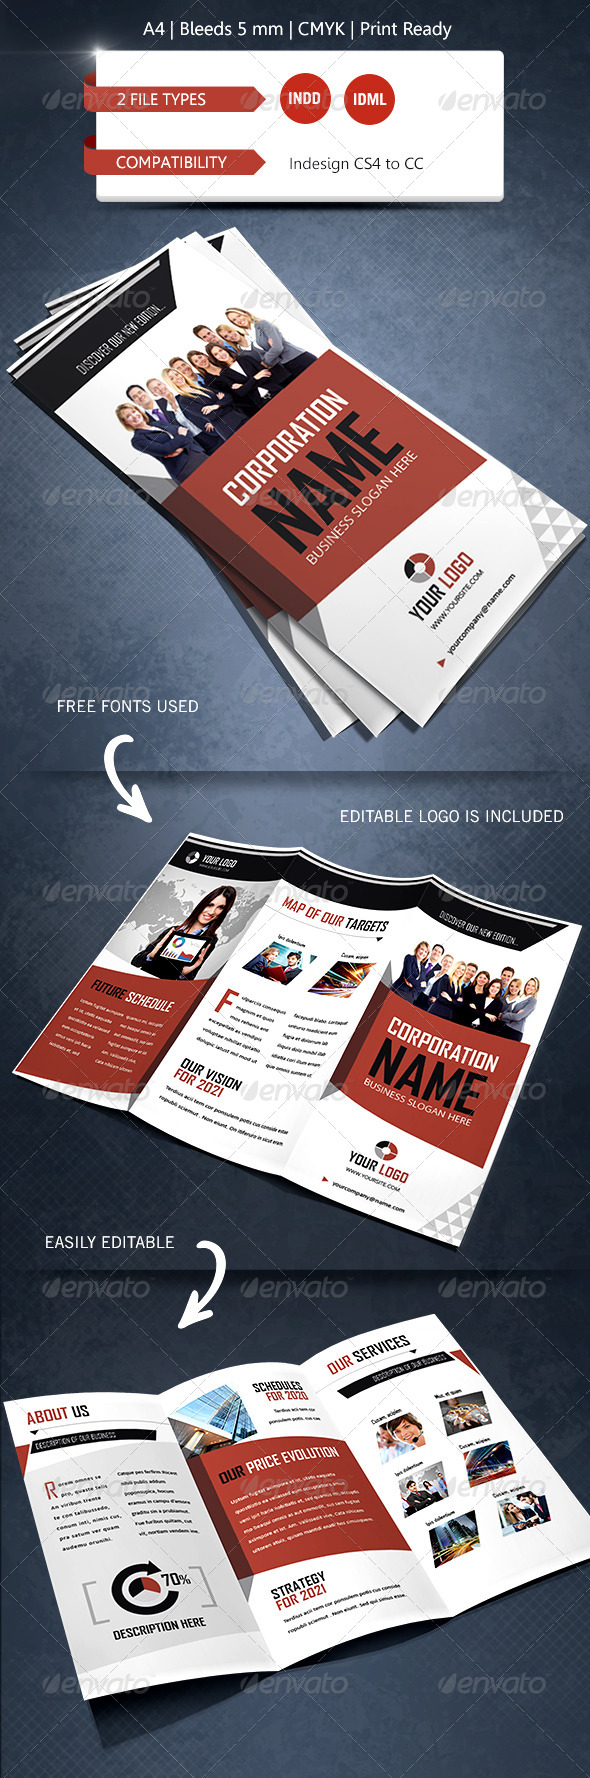 Creative & Corporate Trifold Brochure Template